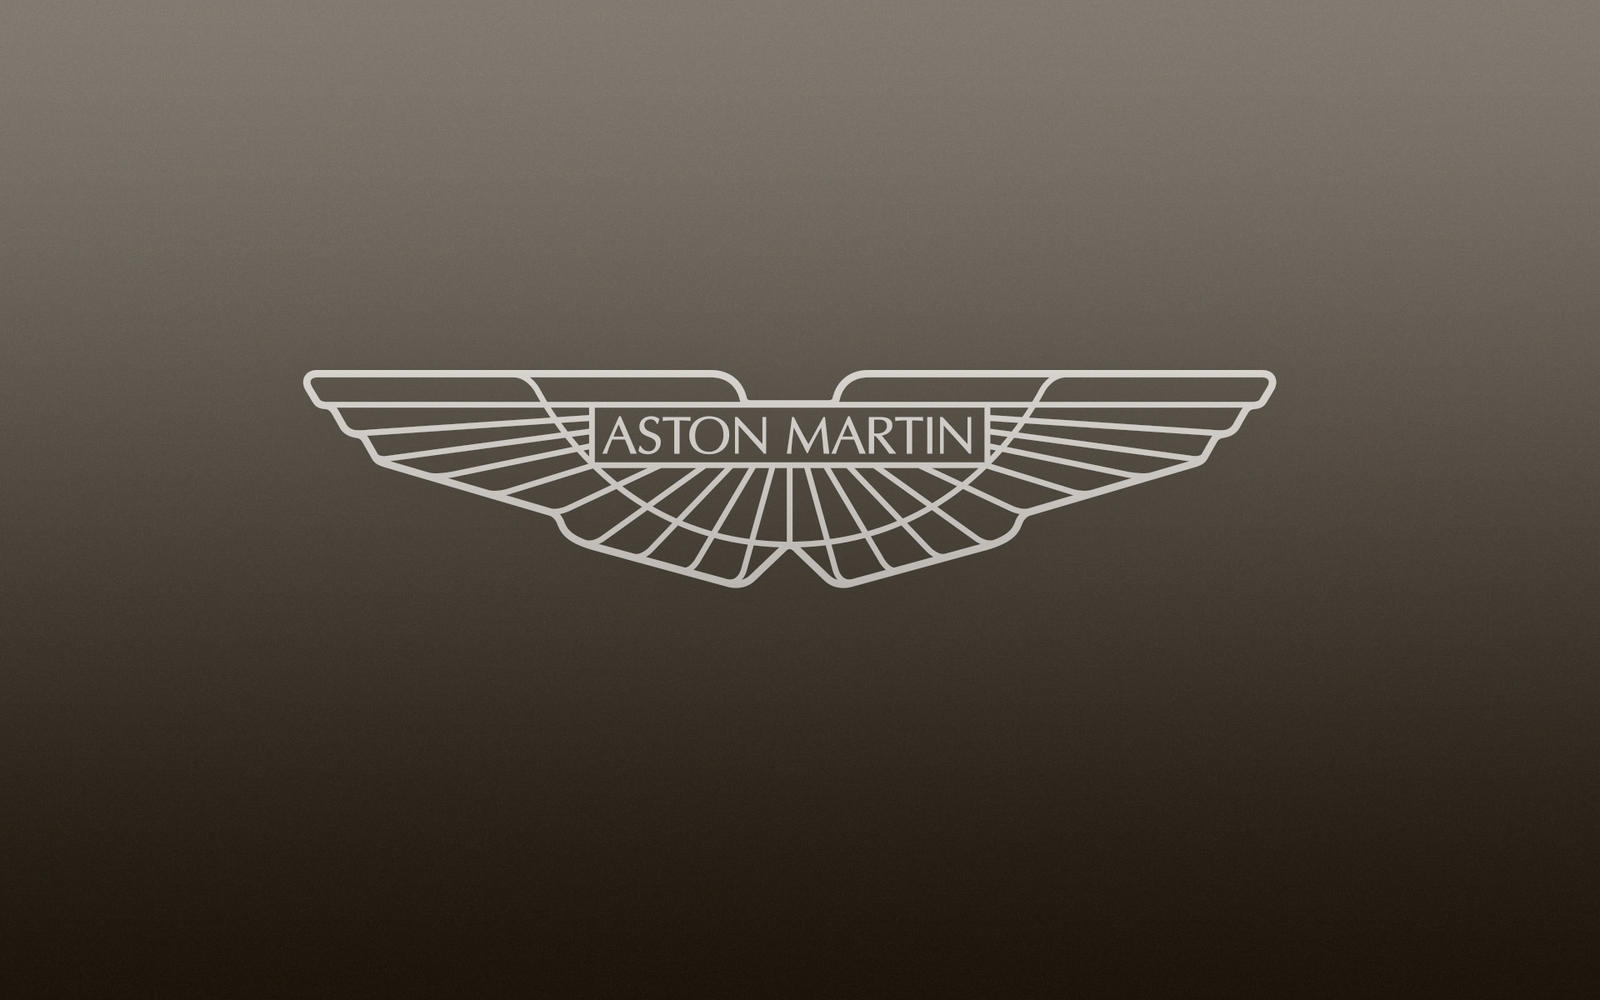 aston martin logo wallpaper. aston martin cocoa wallpaper by igabapple logo